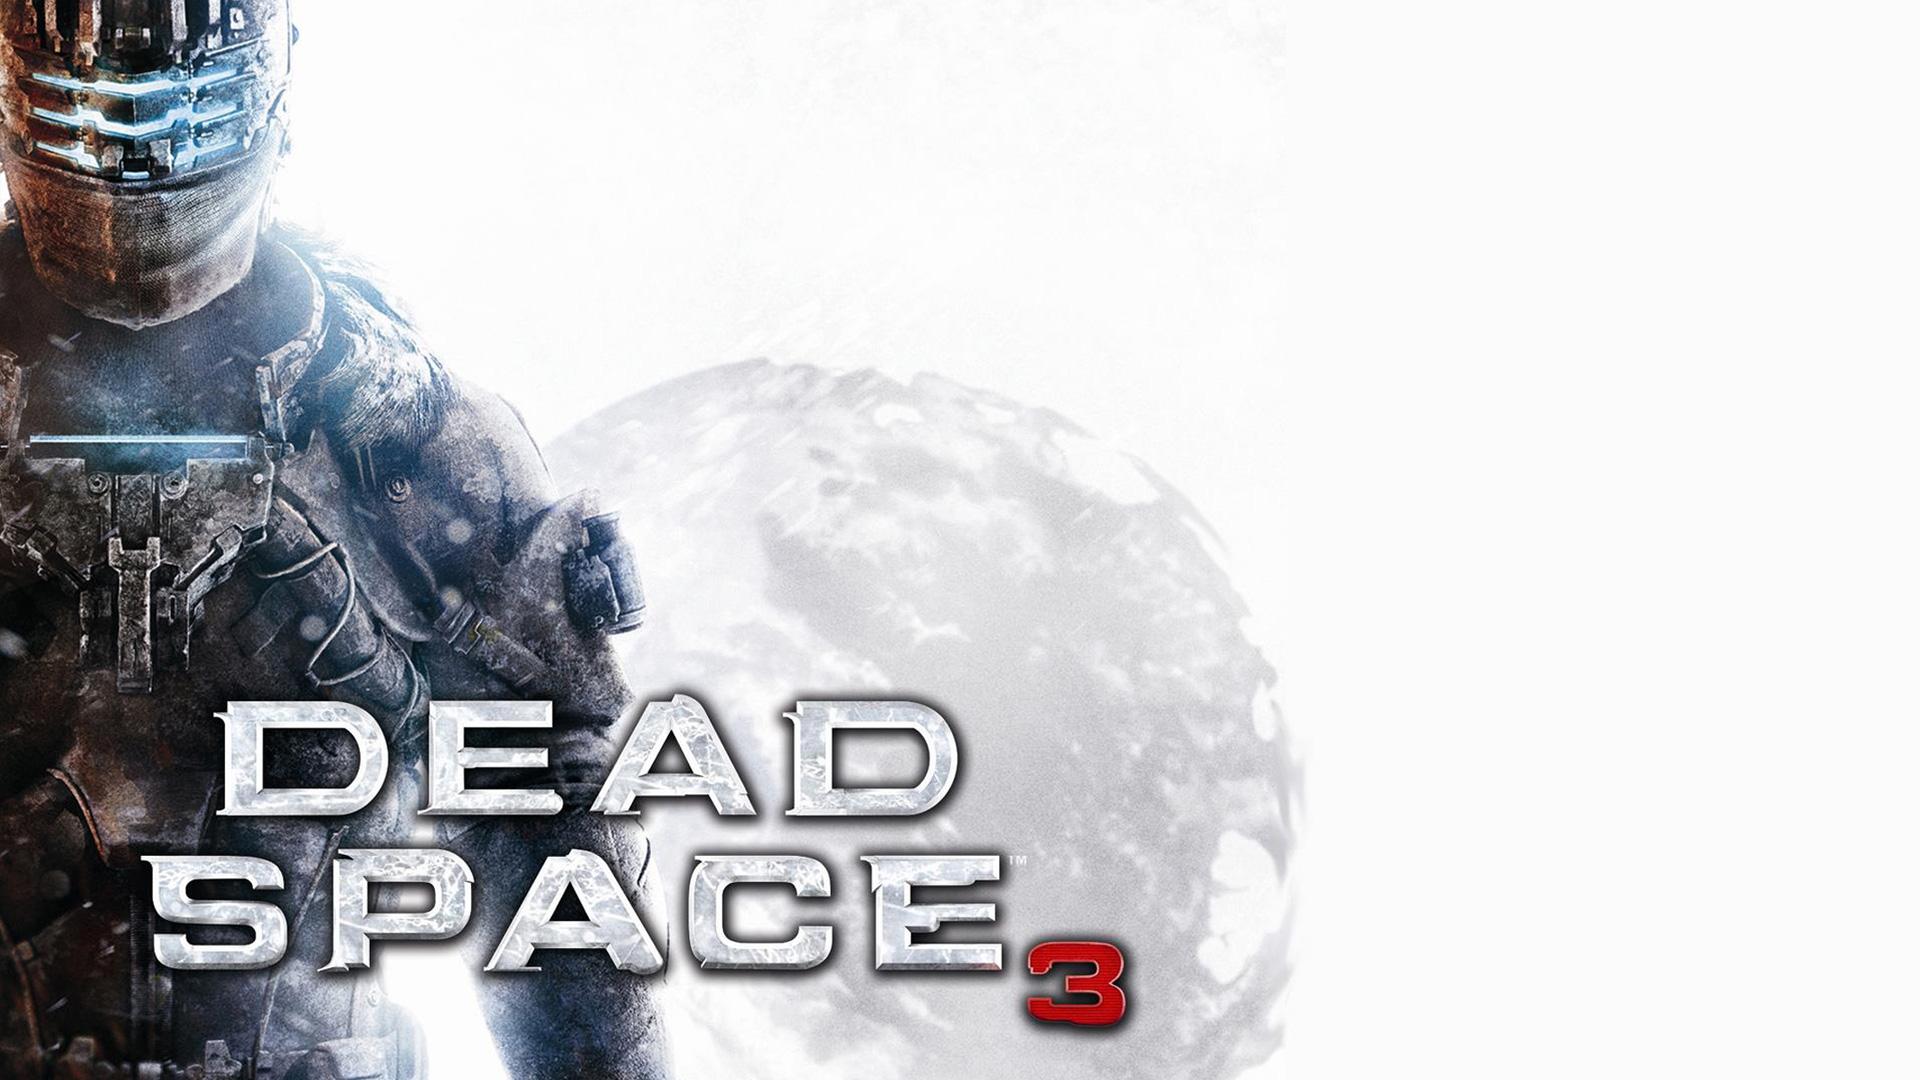 Dead Space 3 Wallpaper HD Page 2 1920x1080